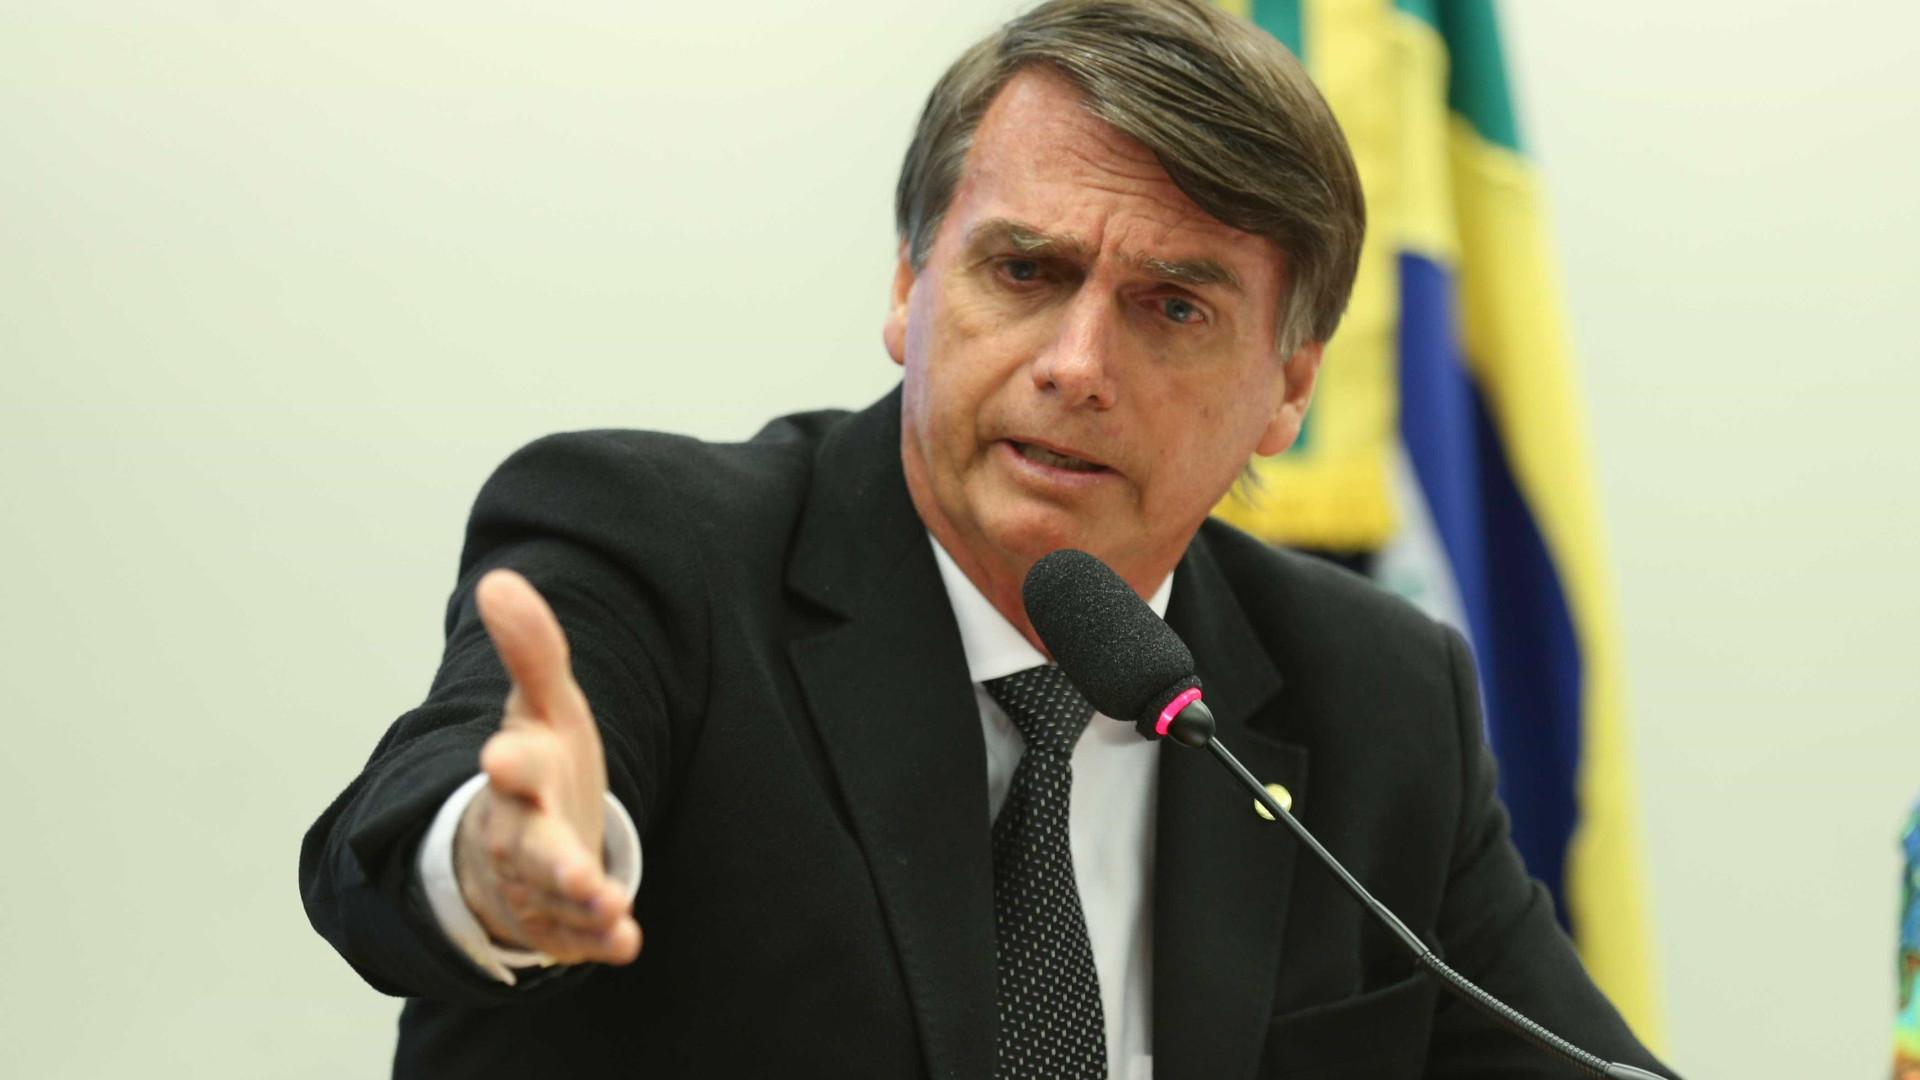 Bolsonaro promete cortar verba publicitária da Globo, caso eleito